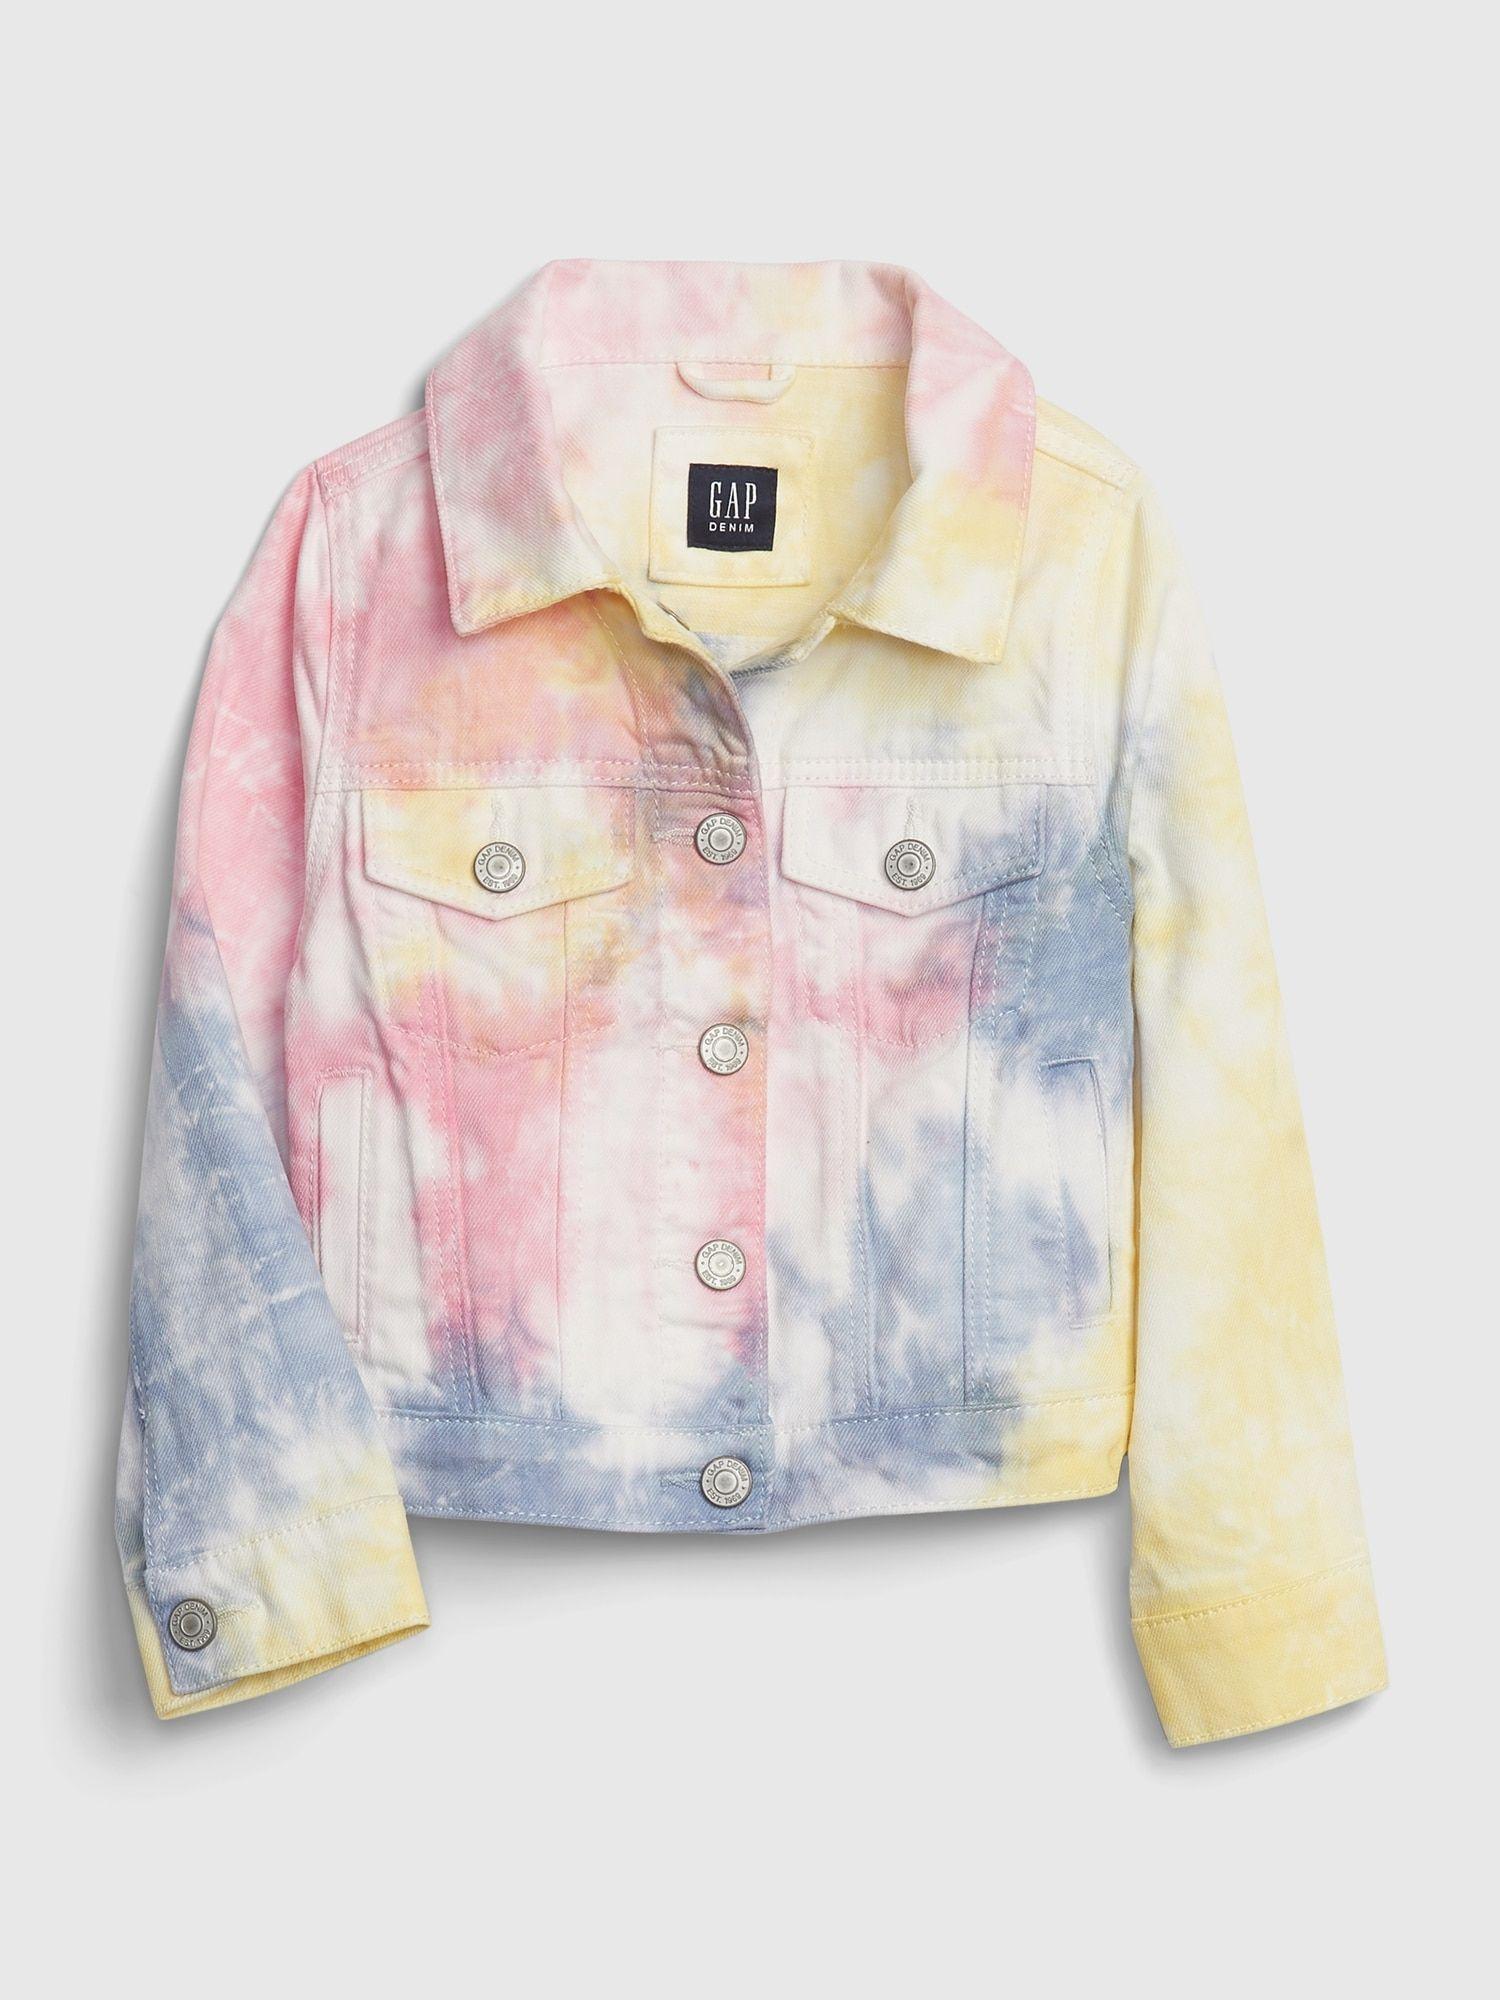 Toddler Tie Dye Denim Jacket Gap Tie Dye Denim Clothes Tie Dye Outfits [ 2000 x 1500 Pixel ]